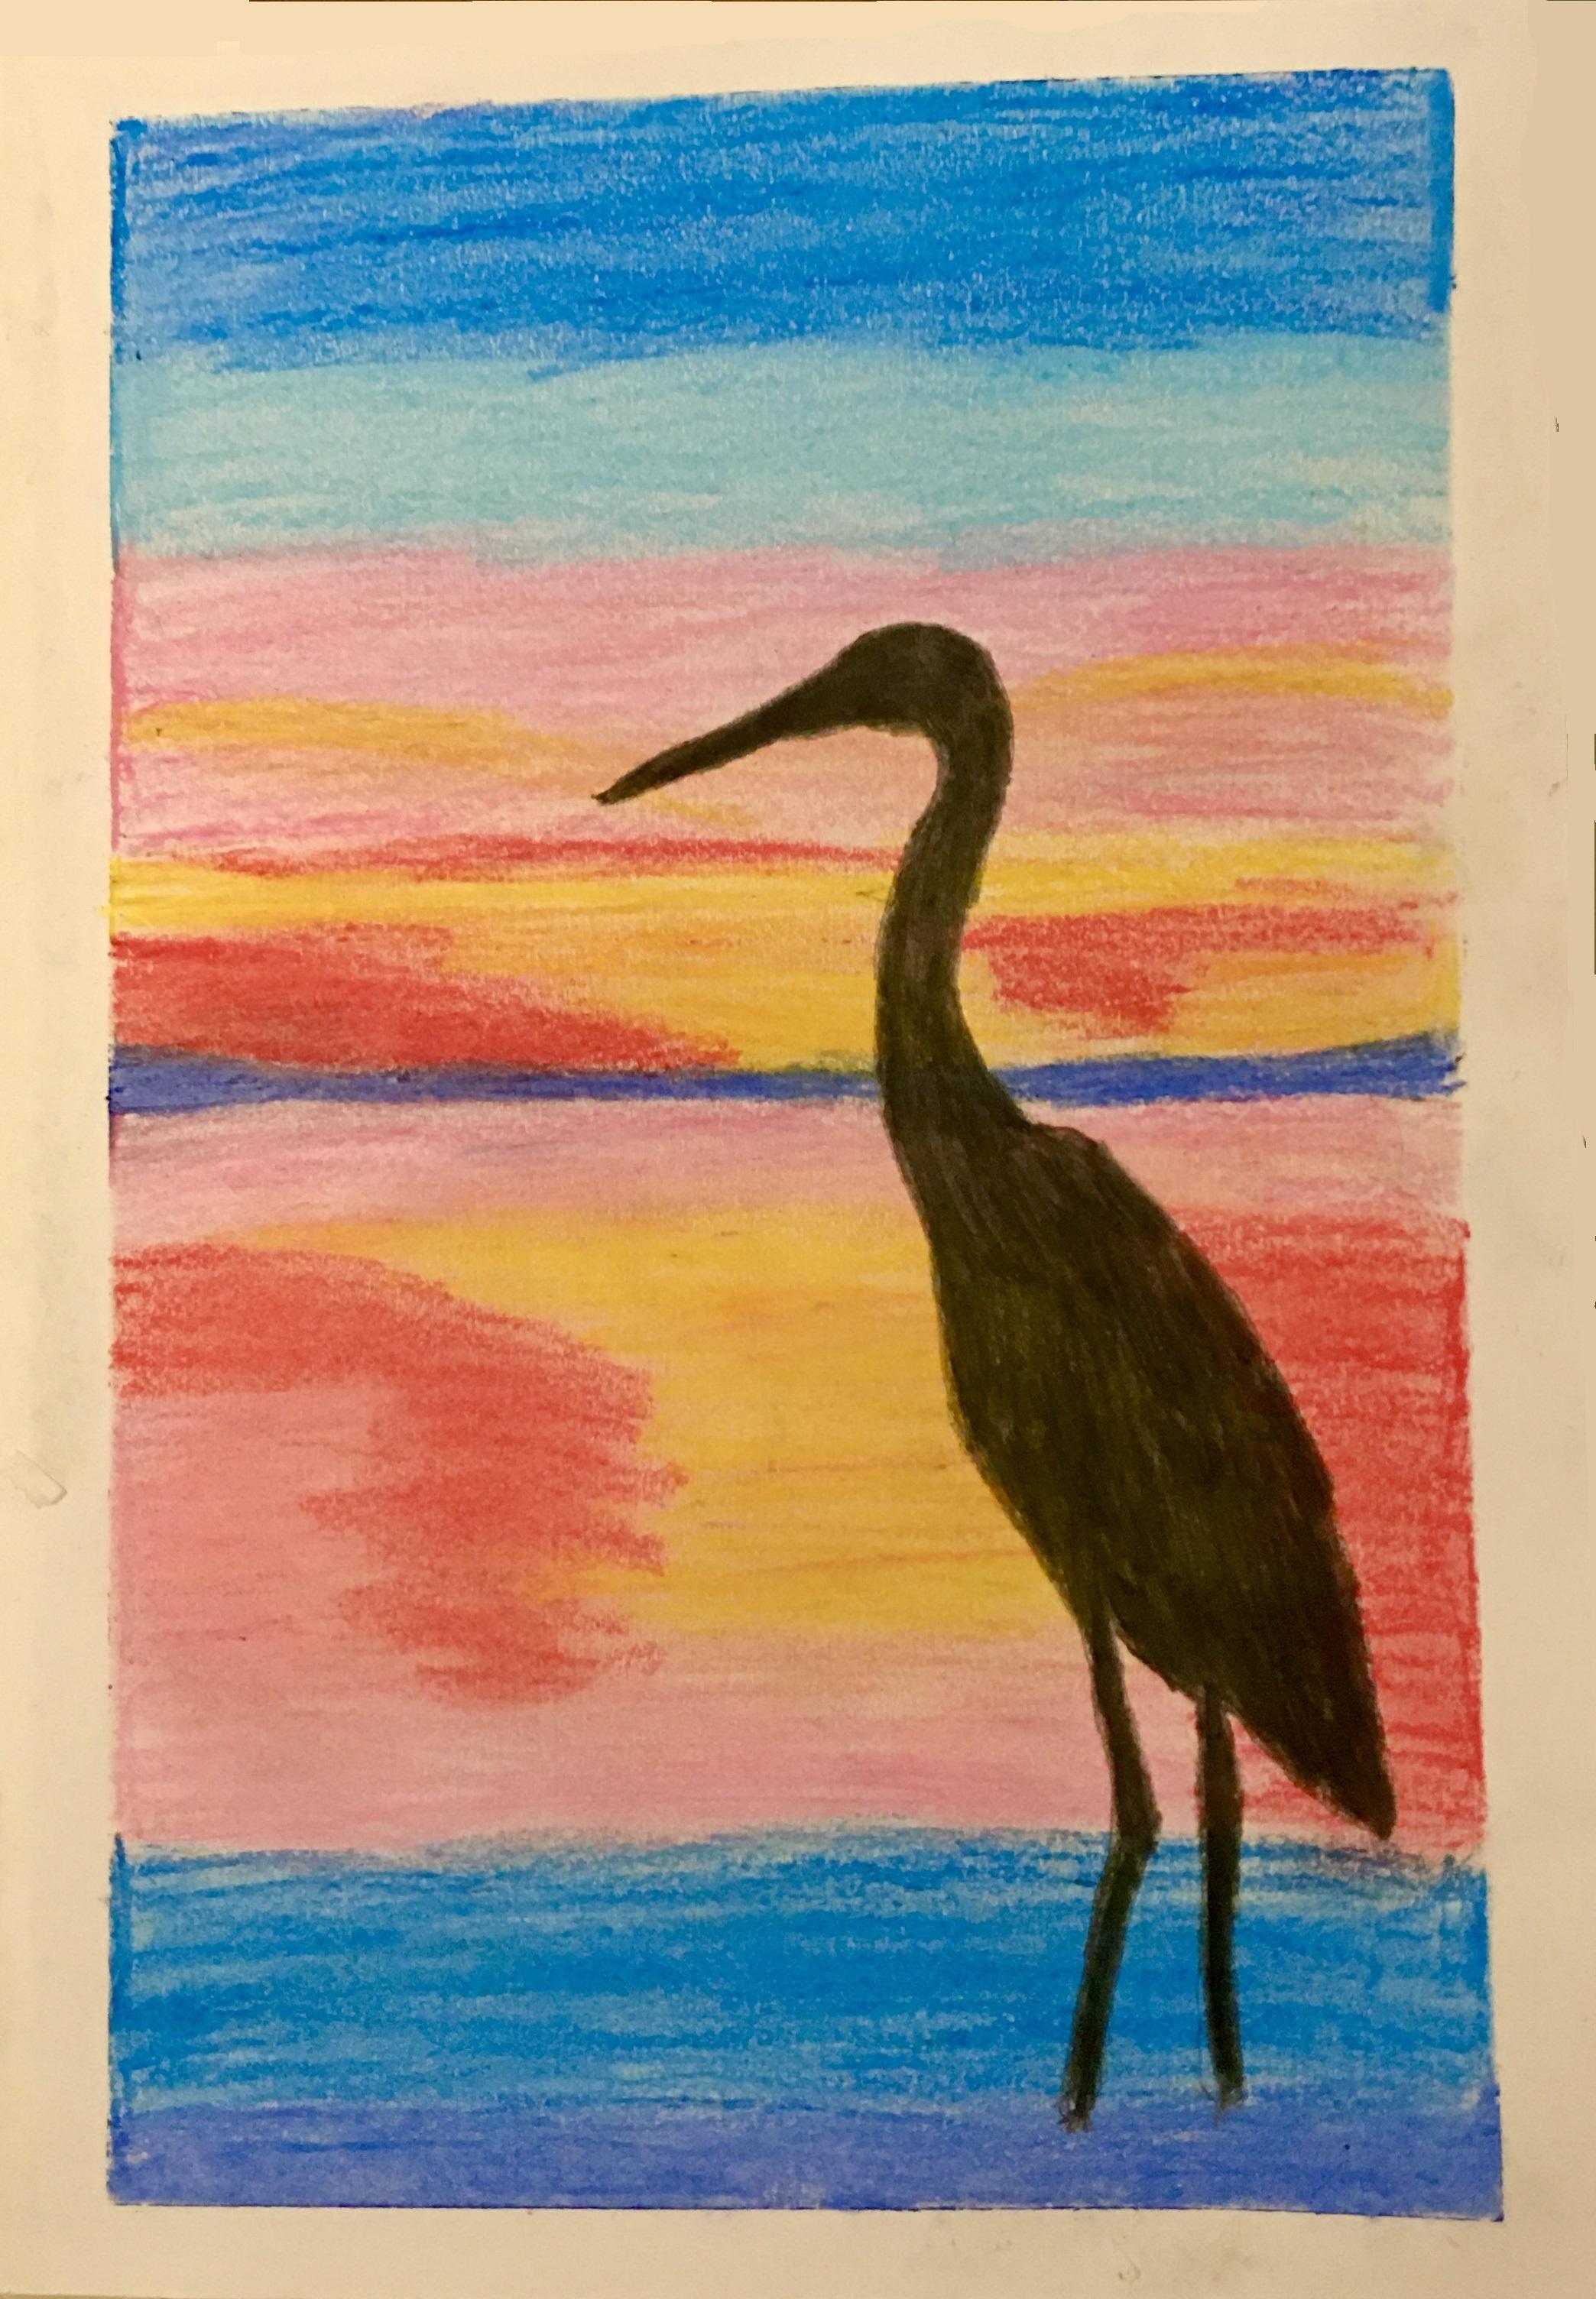 Egret in Ras Al Khor Wildlife Sanctuary in Dubai by Evelyn Elizabeth Suhas